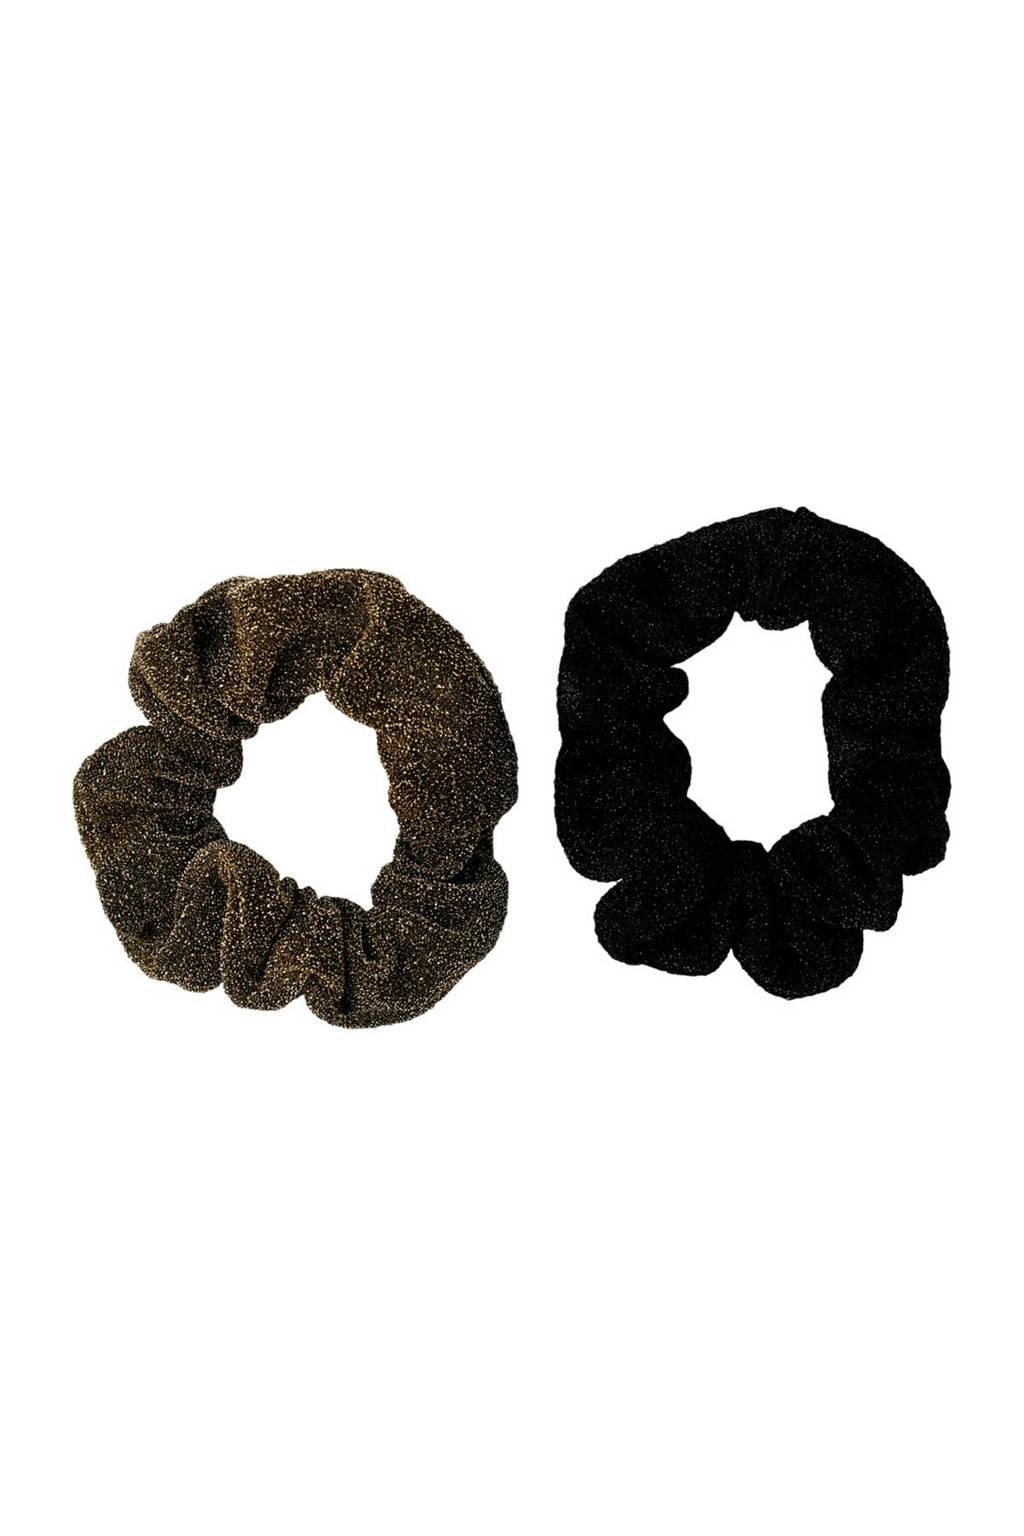 PIECES haarband zwart, Zwart